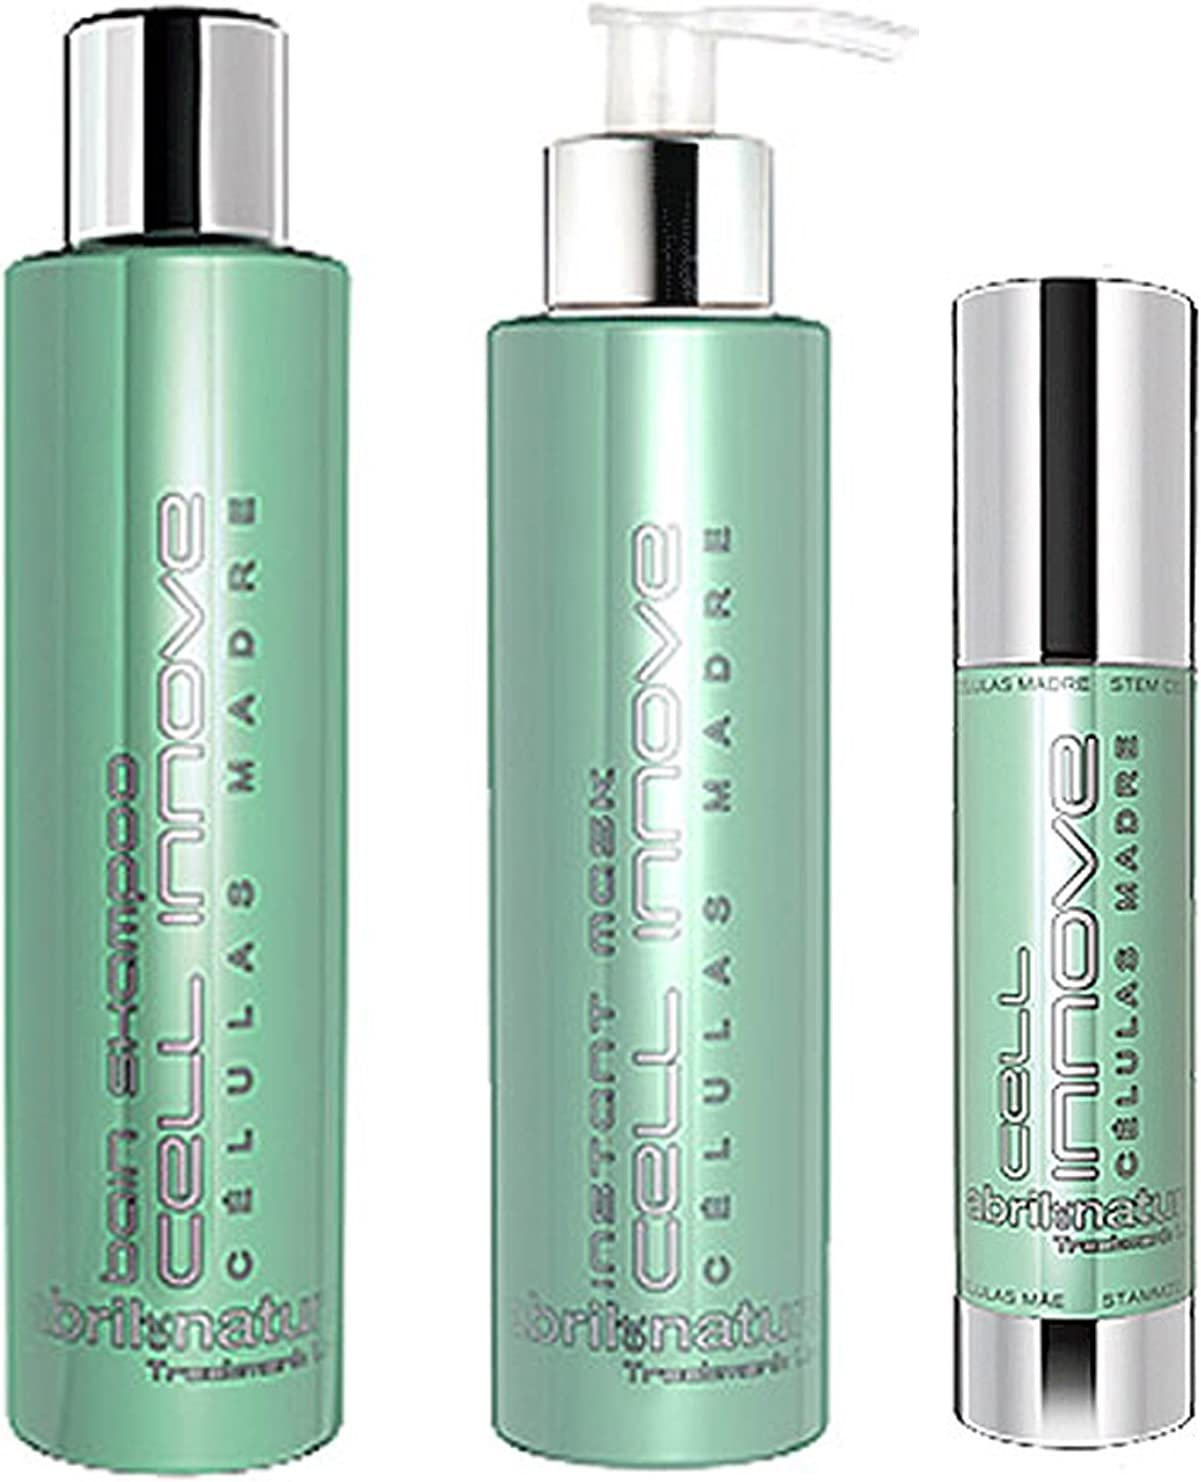 Abril et Nature Cell Innove Pack 3 Productos Tratamiento Celulas Madre: Amazon.es: Belleza